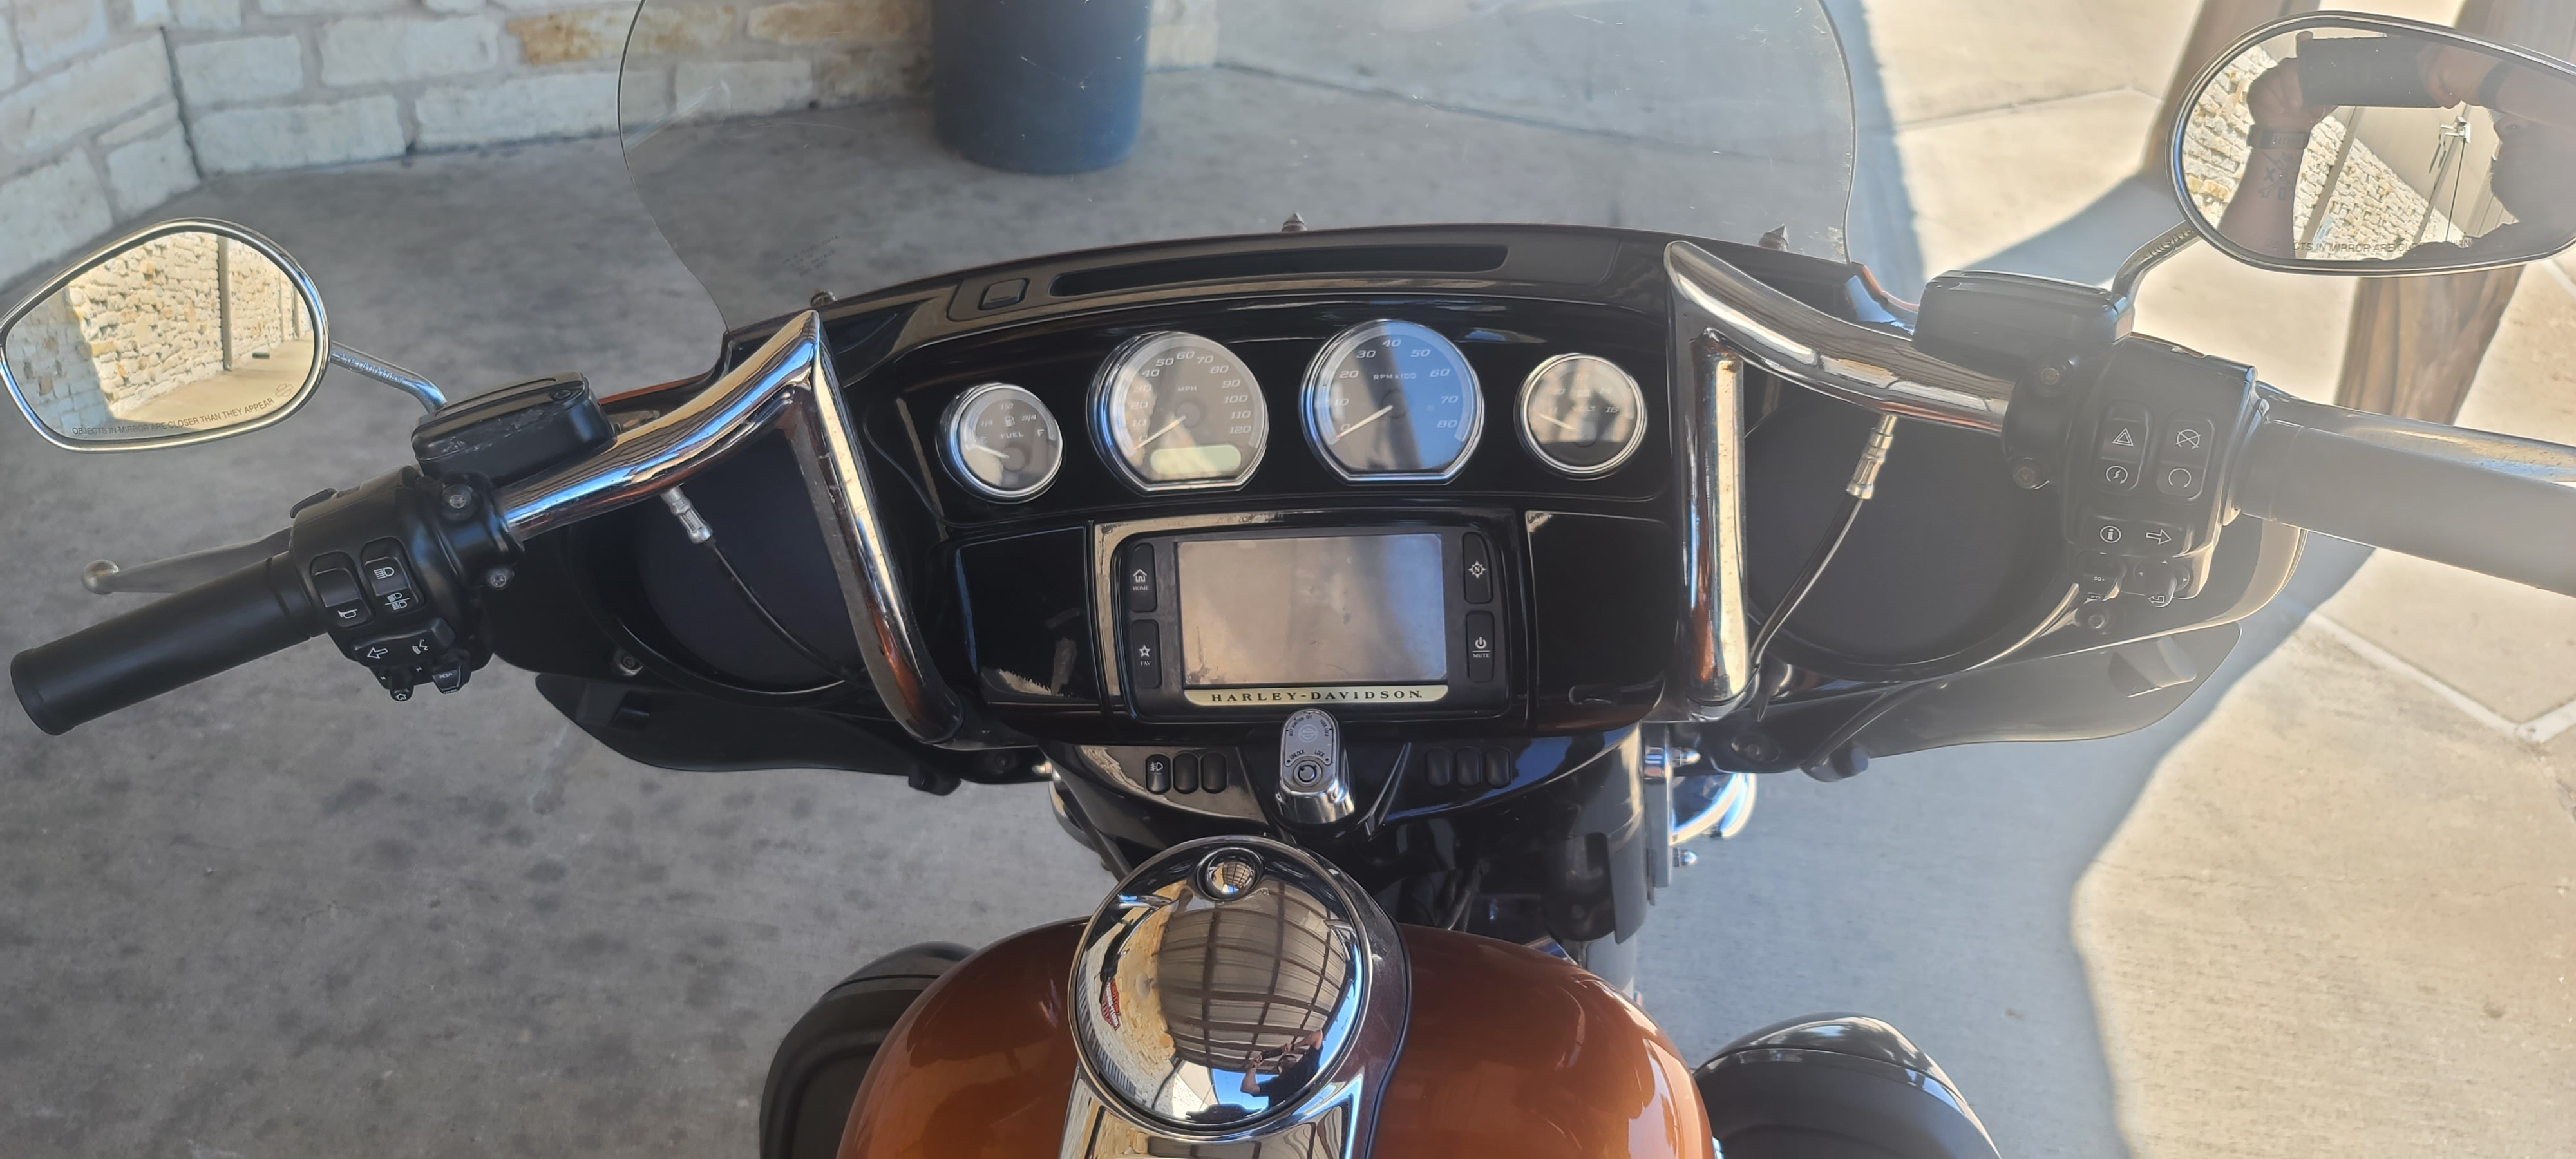 2015 Harley-Davidson FLHTKL at Harley-Davidson of Waco